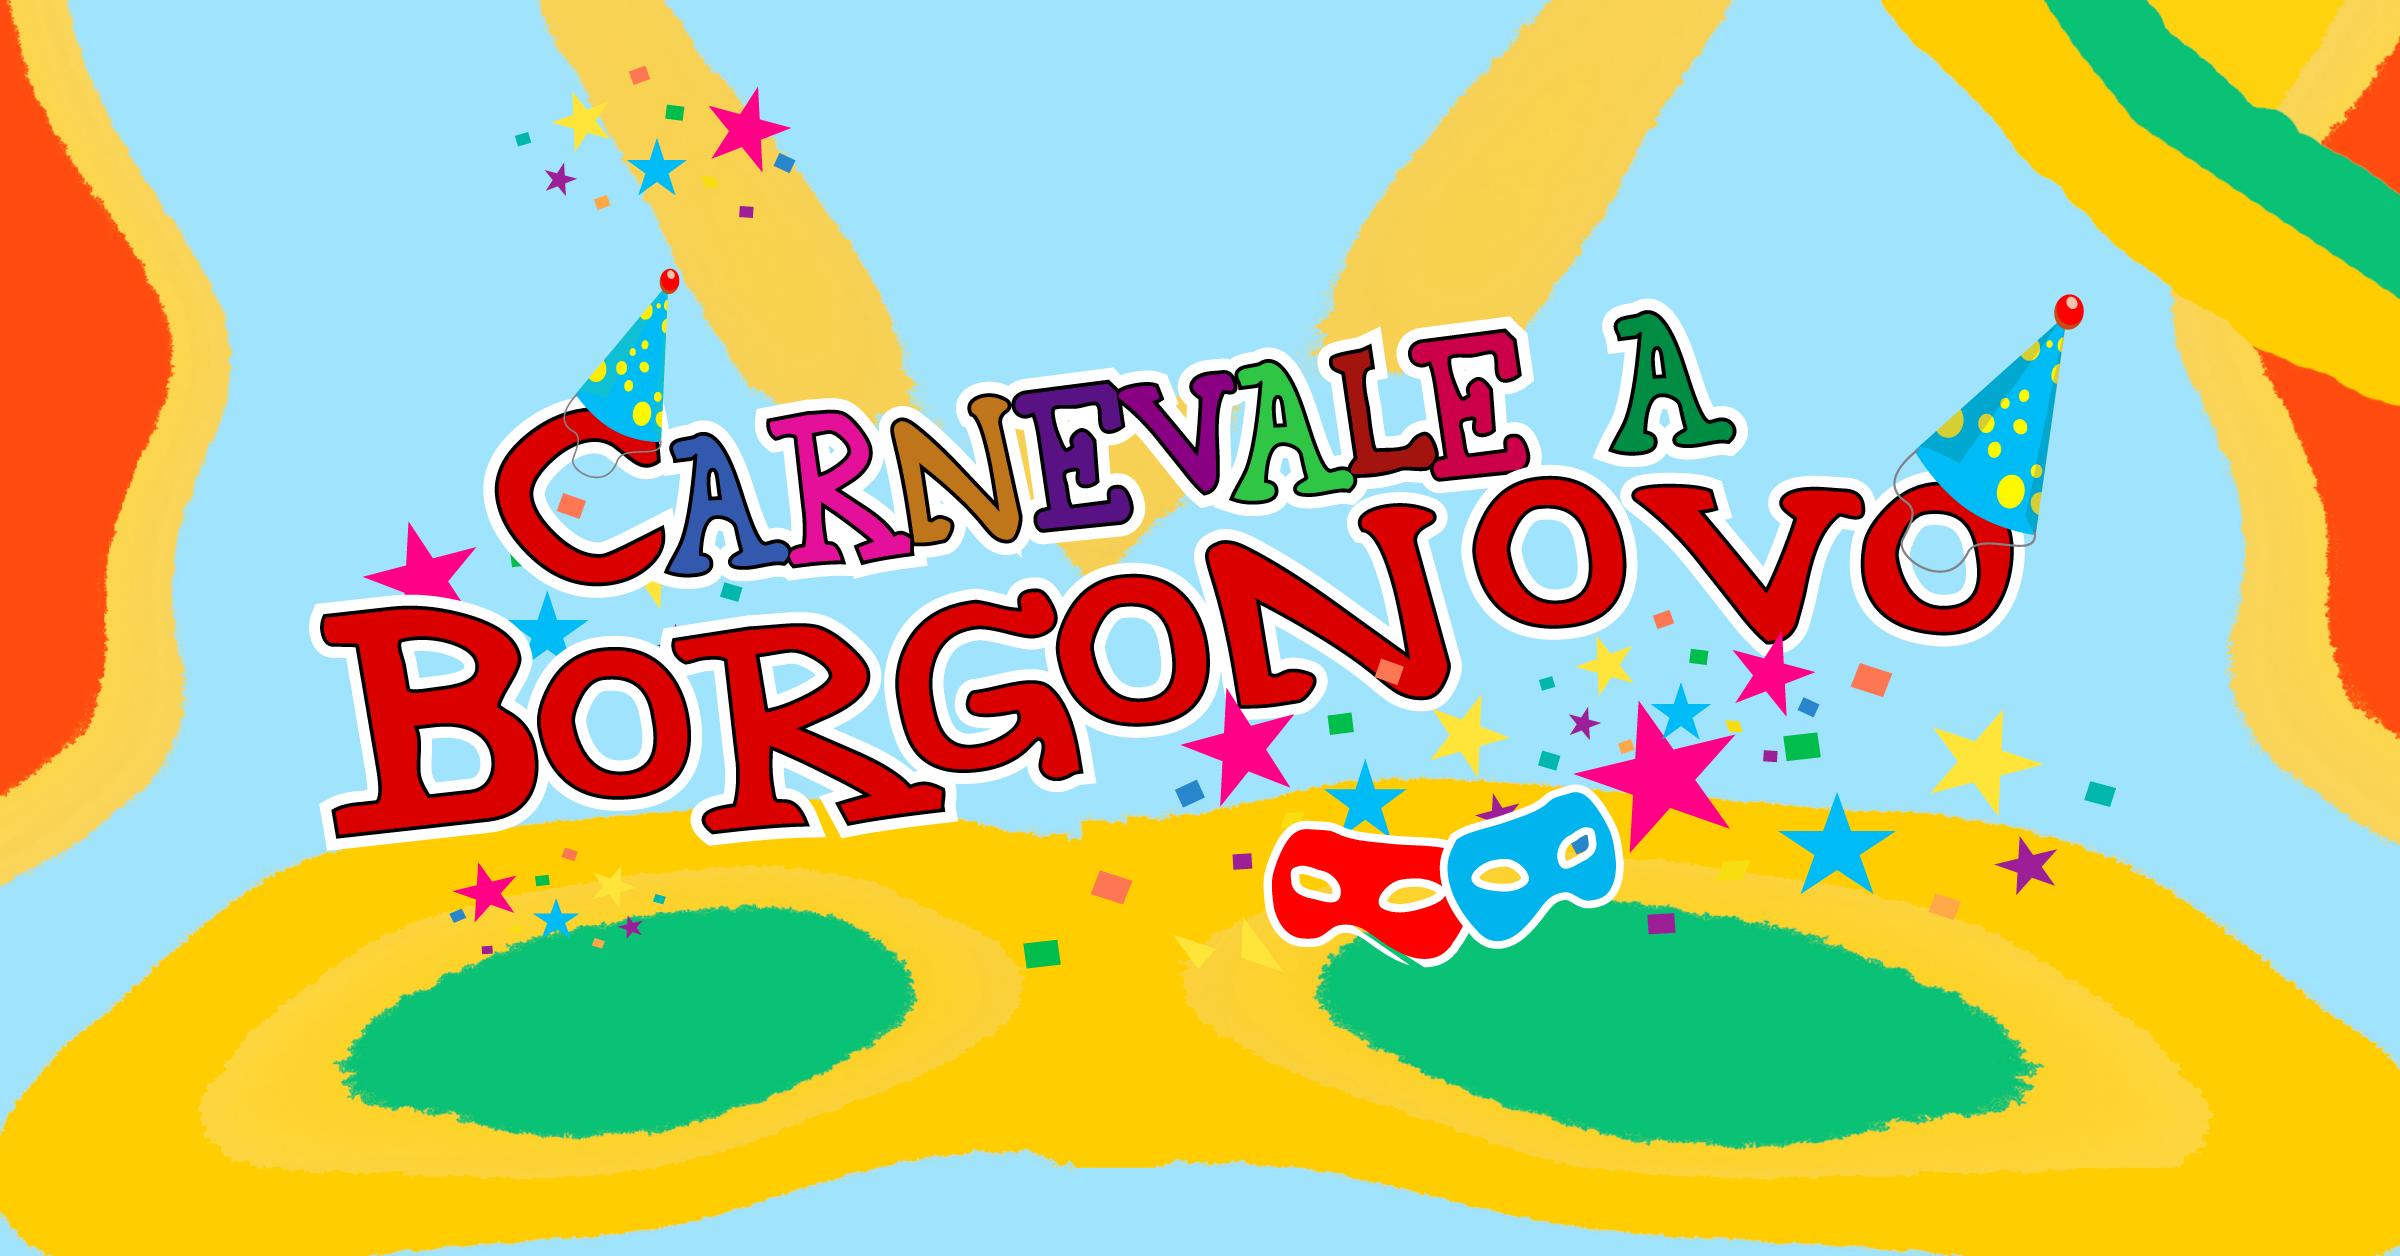 Carnevale a Borgonovo Val Tidone